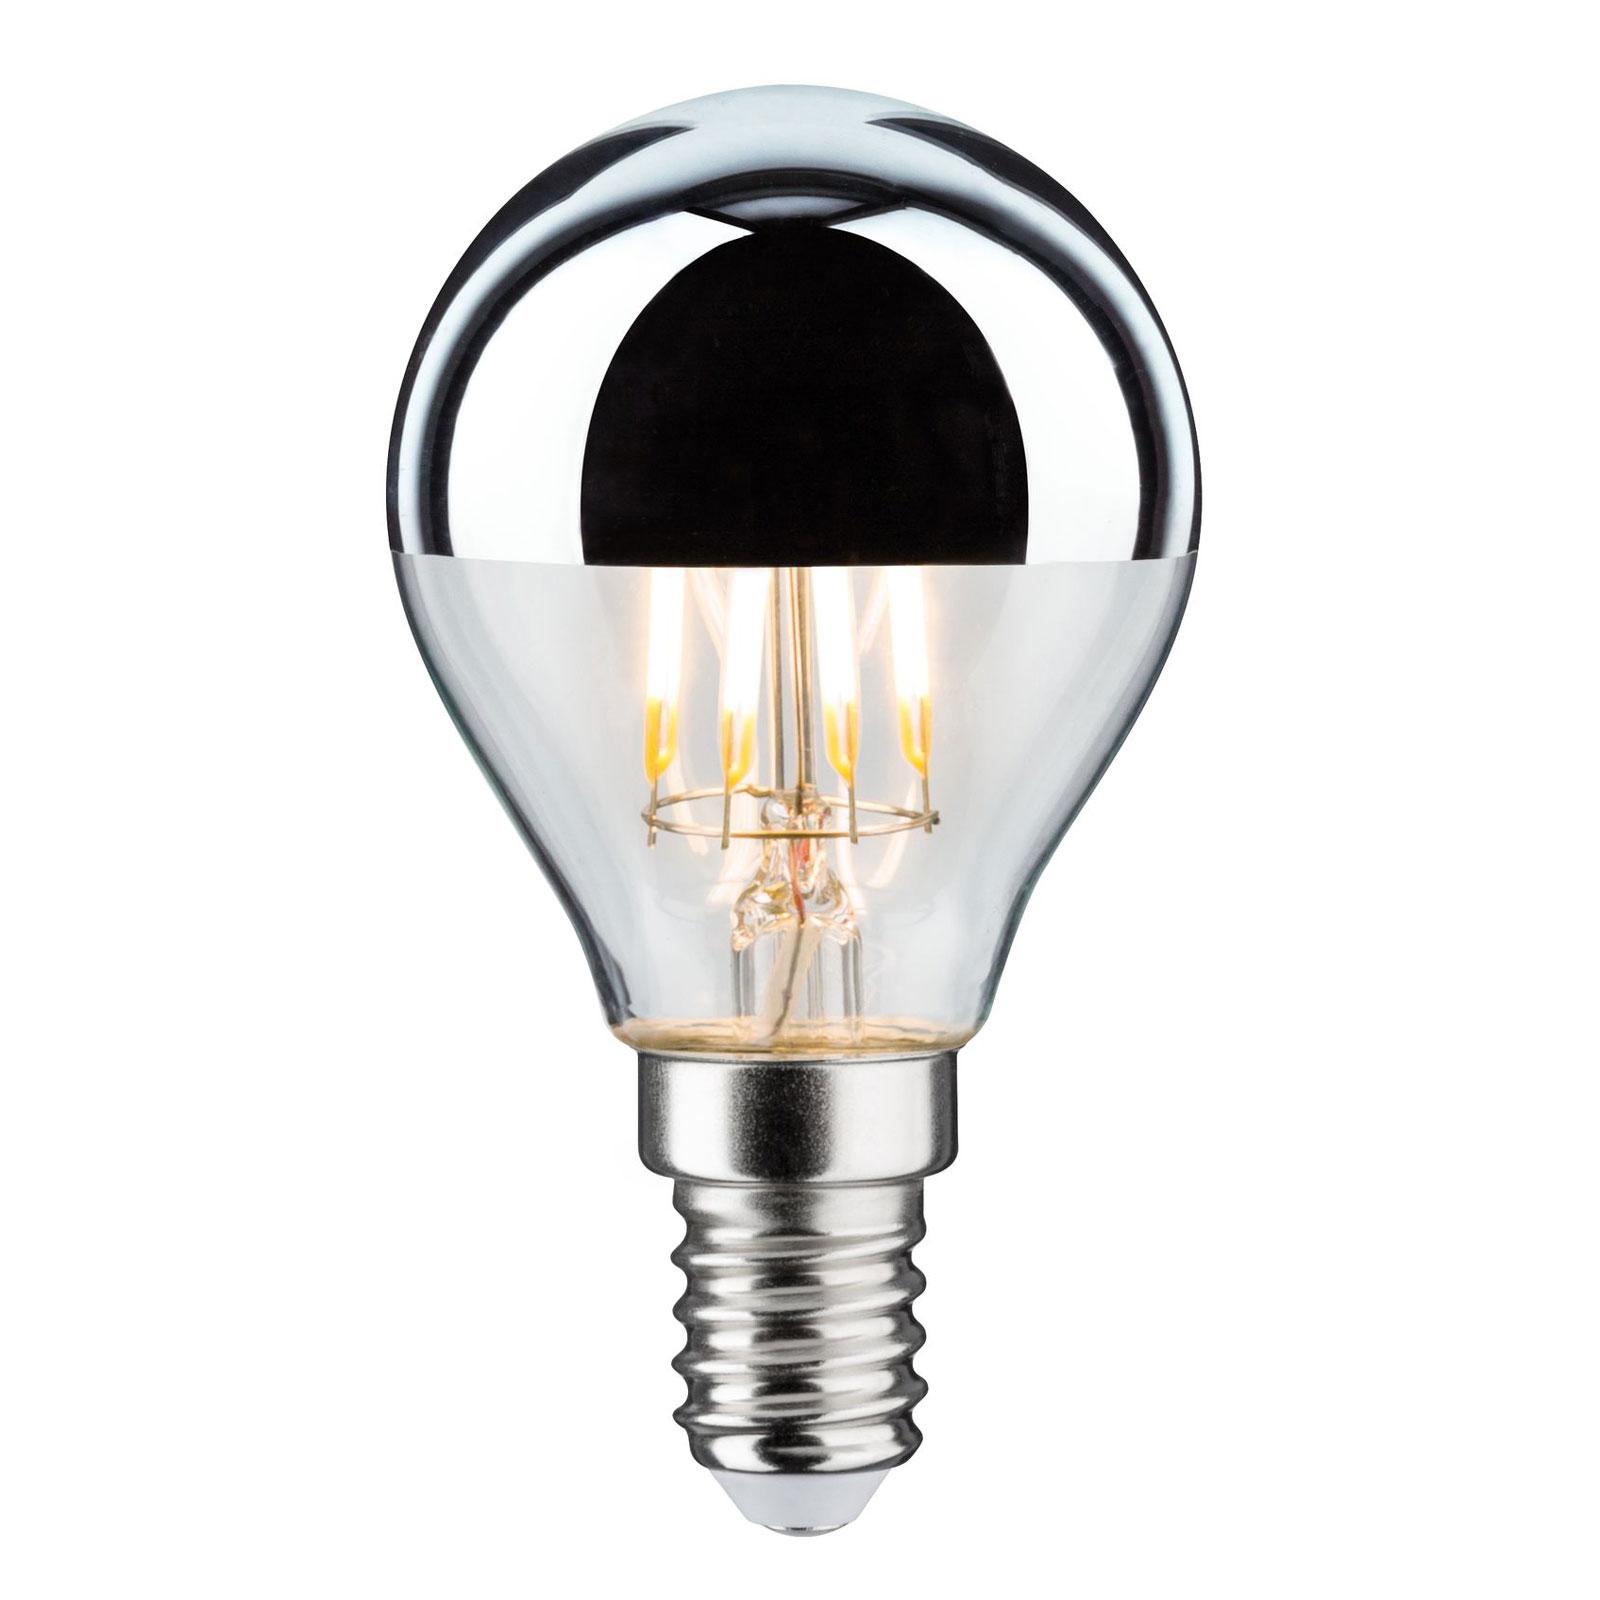 LED-pære E14 827 toppforspeilet sølv 4,8 W dimbar